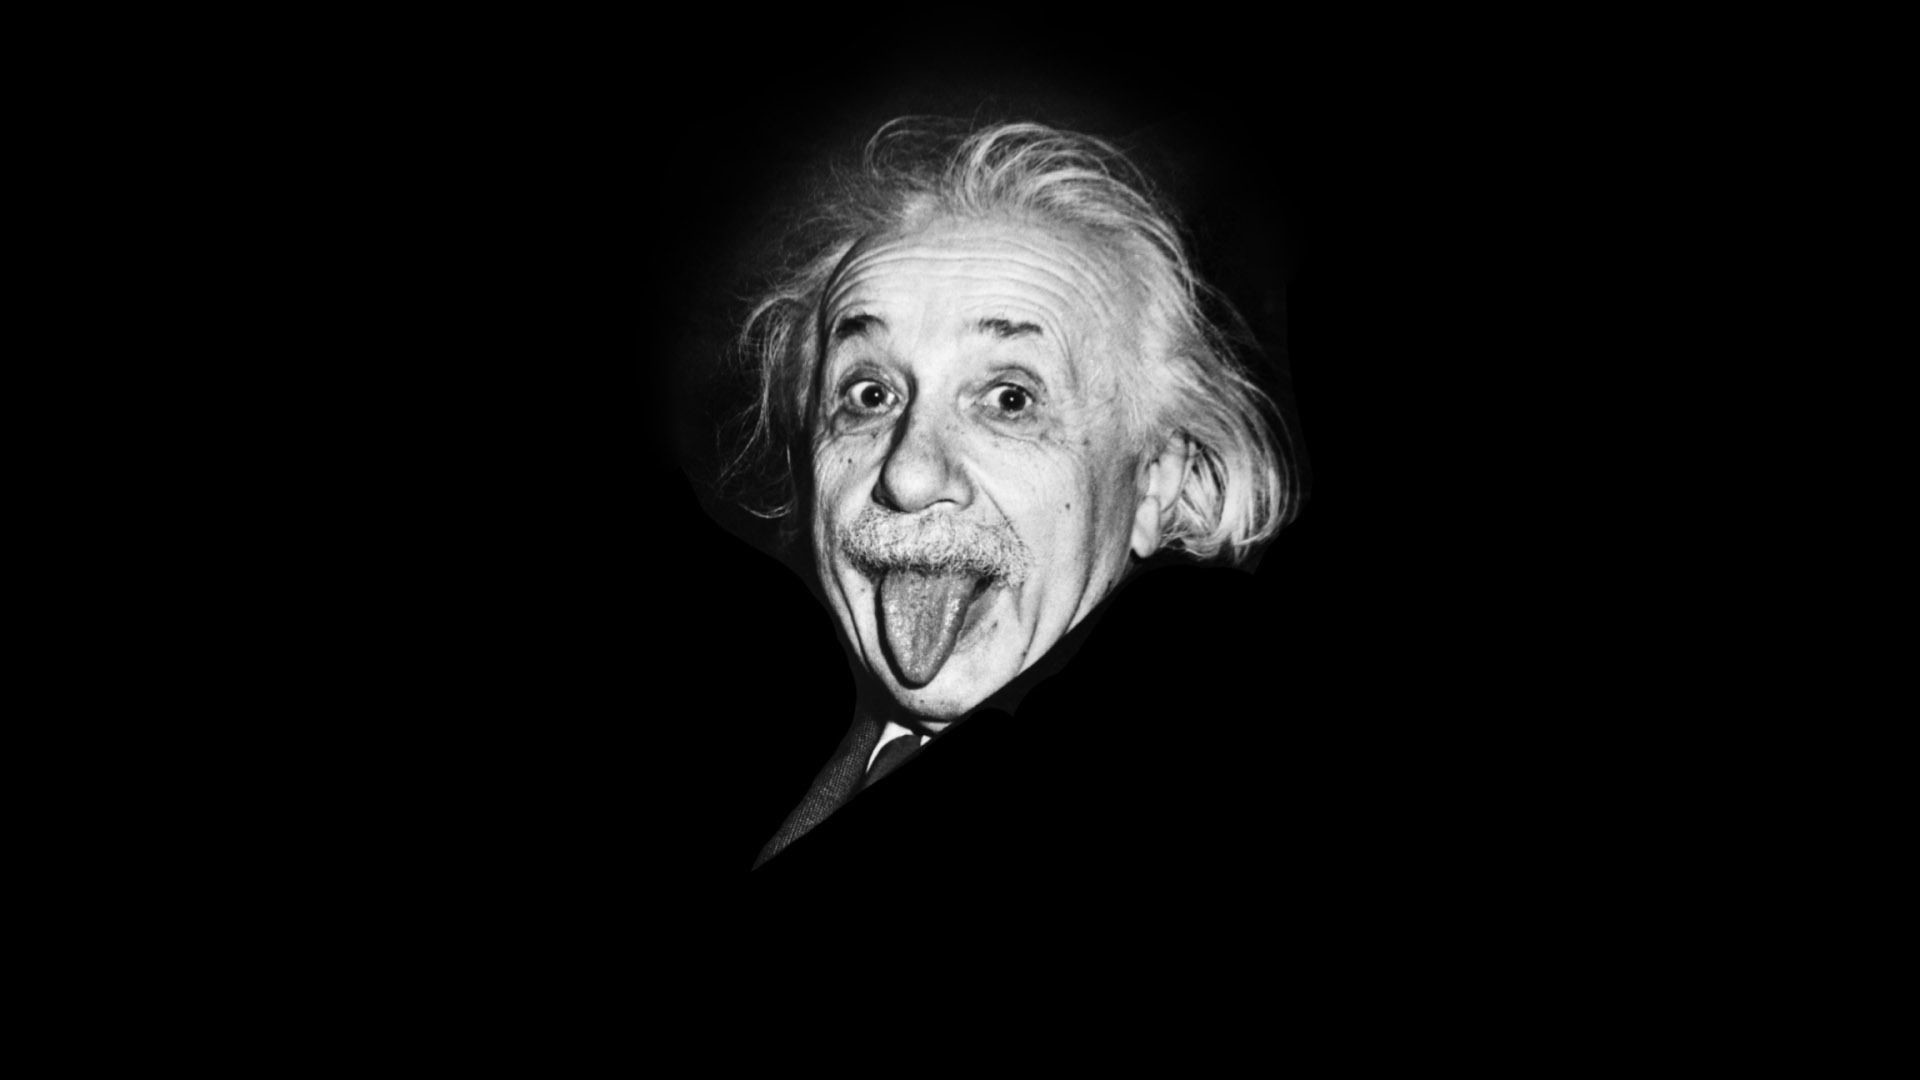 Albert Einstein Wallpapers HD 59 Images